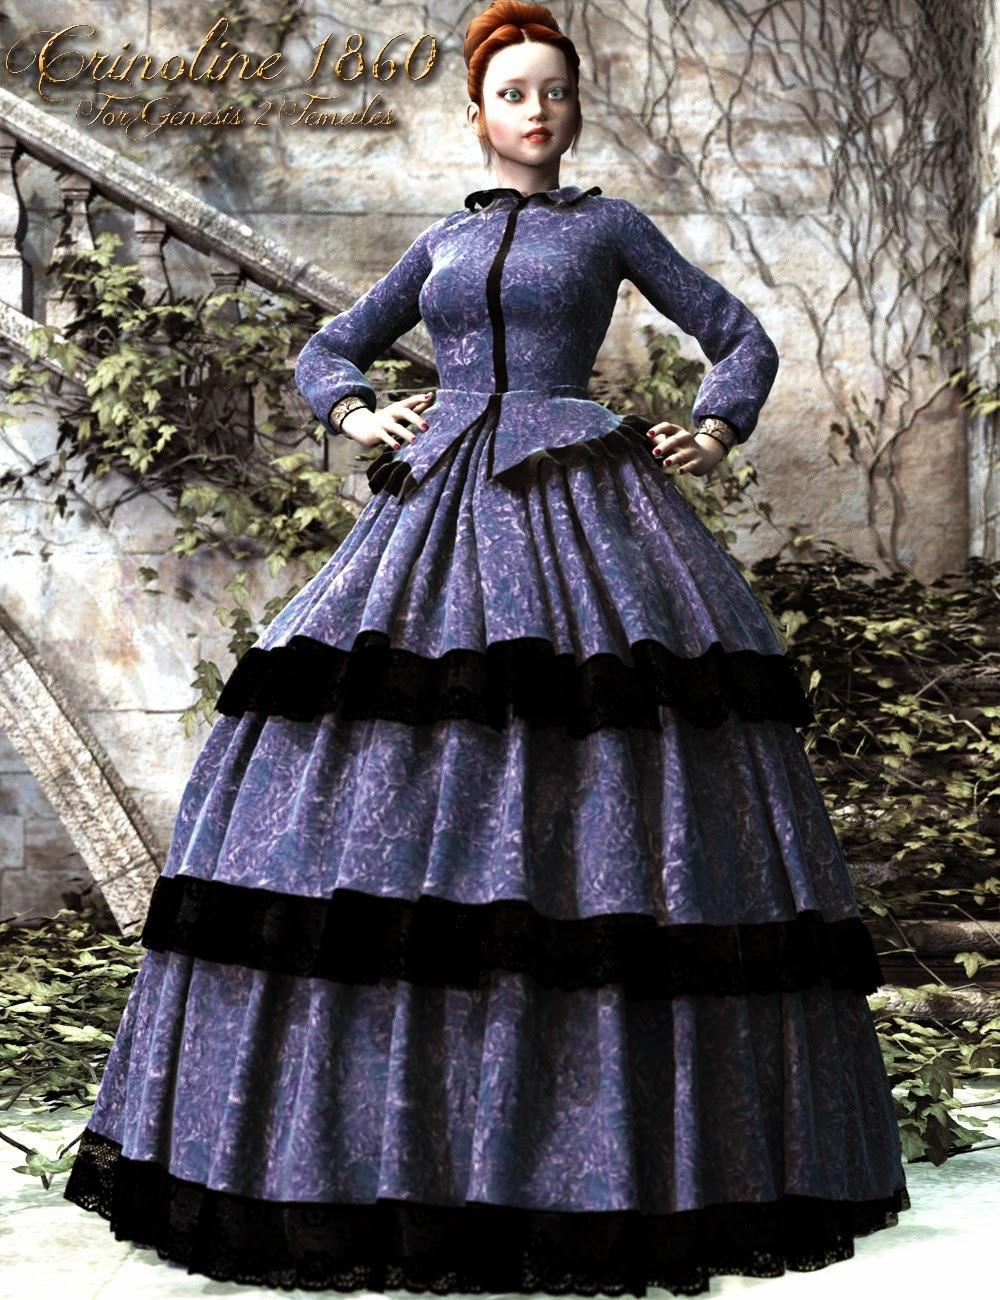 1860 Robe Crinoline pour Genesis 2 Femme